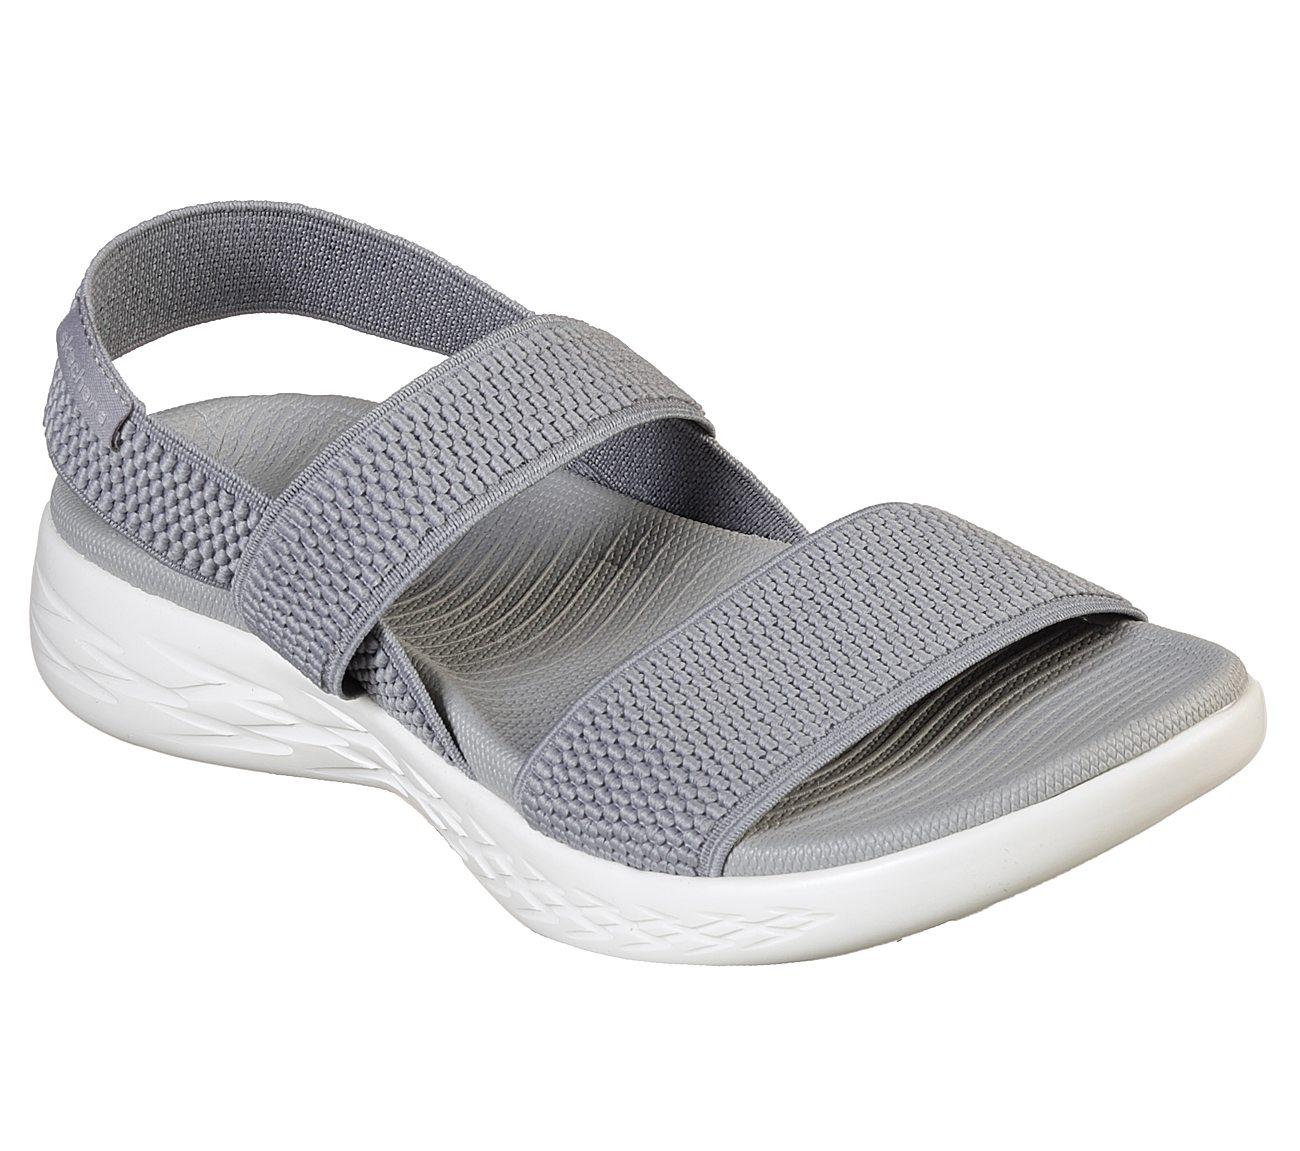 Buy Skechers Skechers On The Go 600 Flawless Skechers Performance Shoes